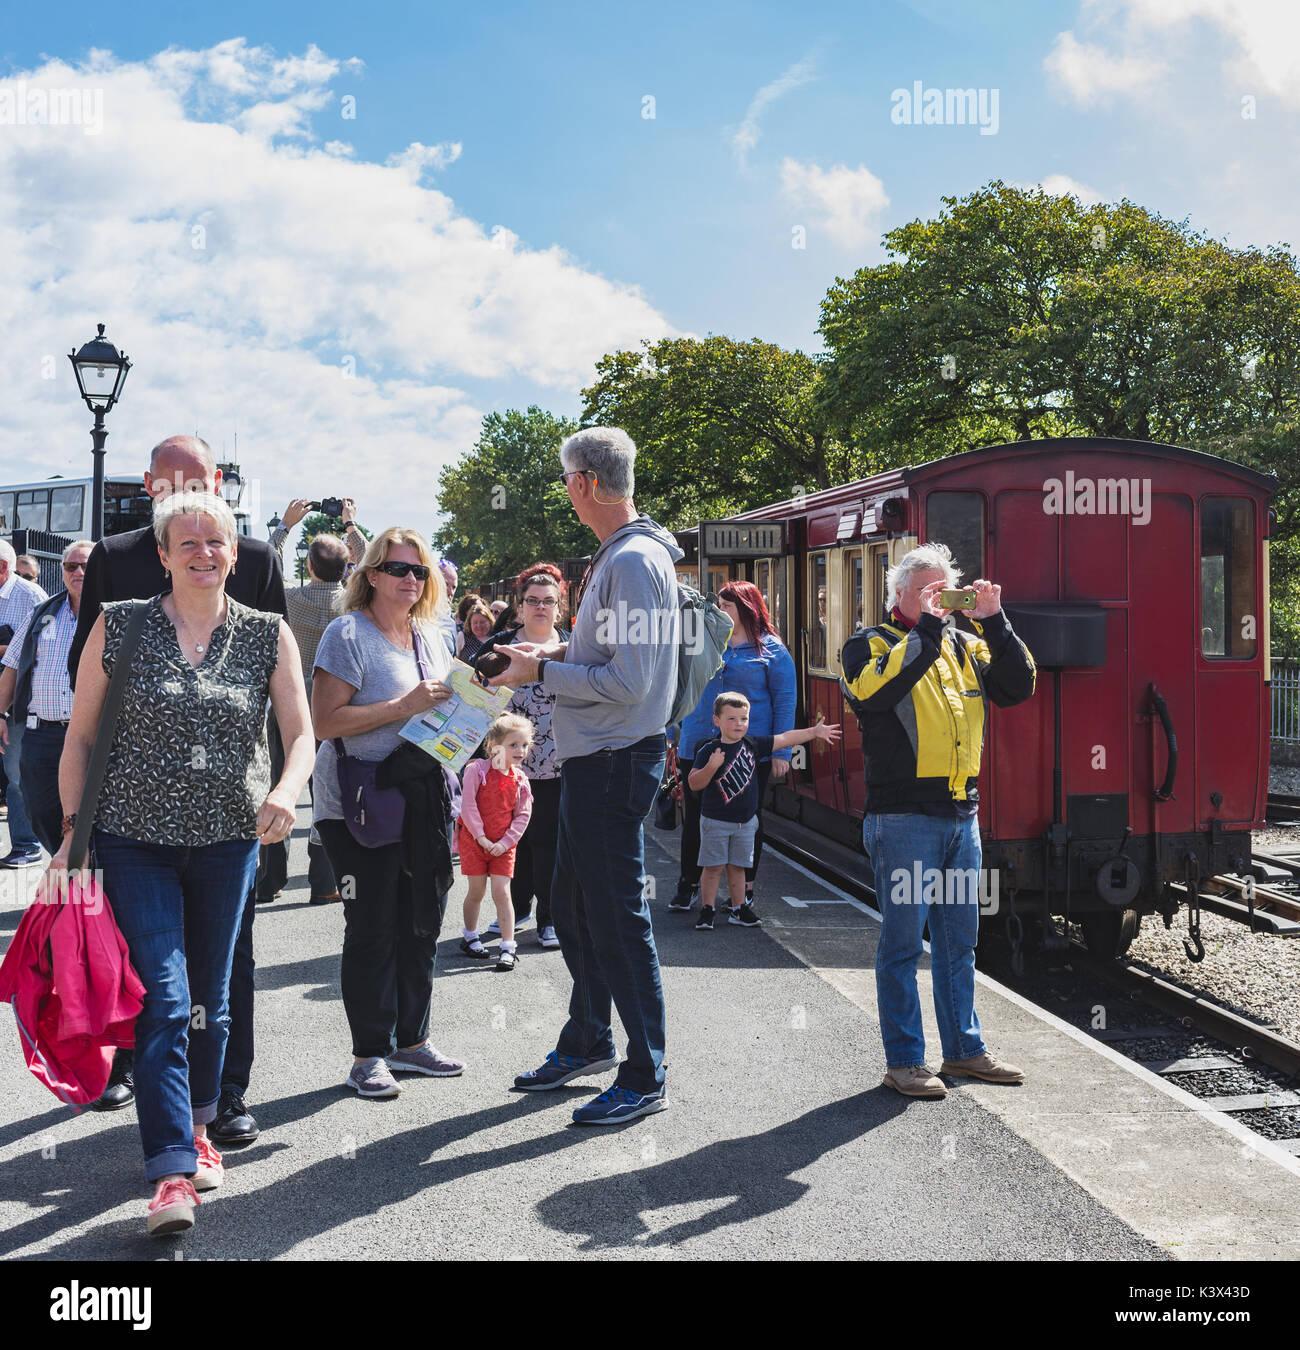 People on railway platform at Port Erin train station - Stock Image